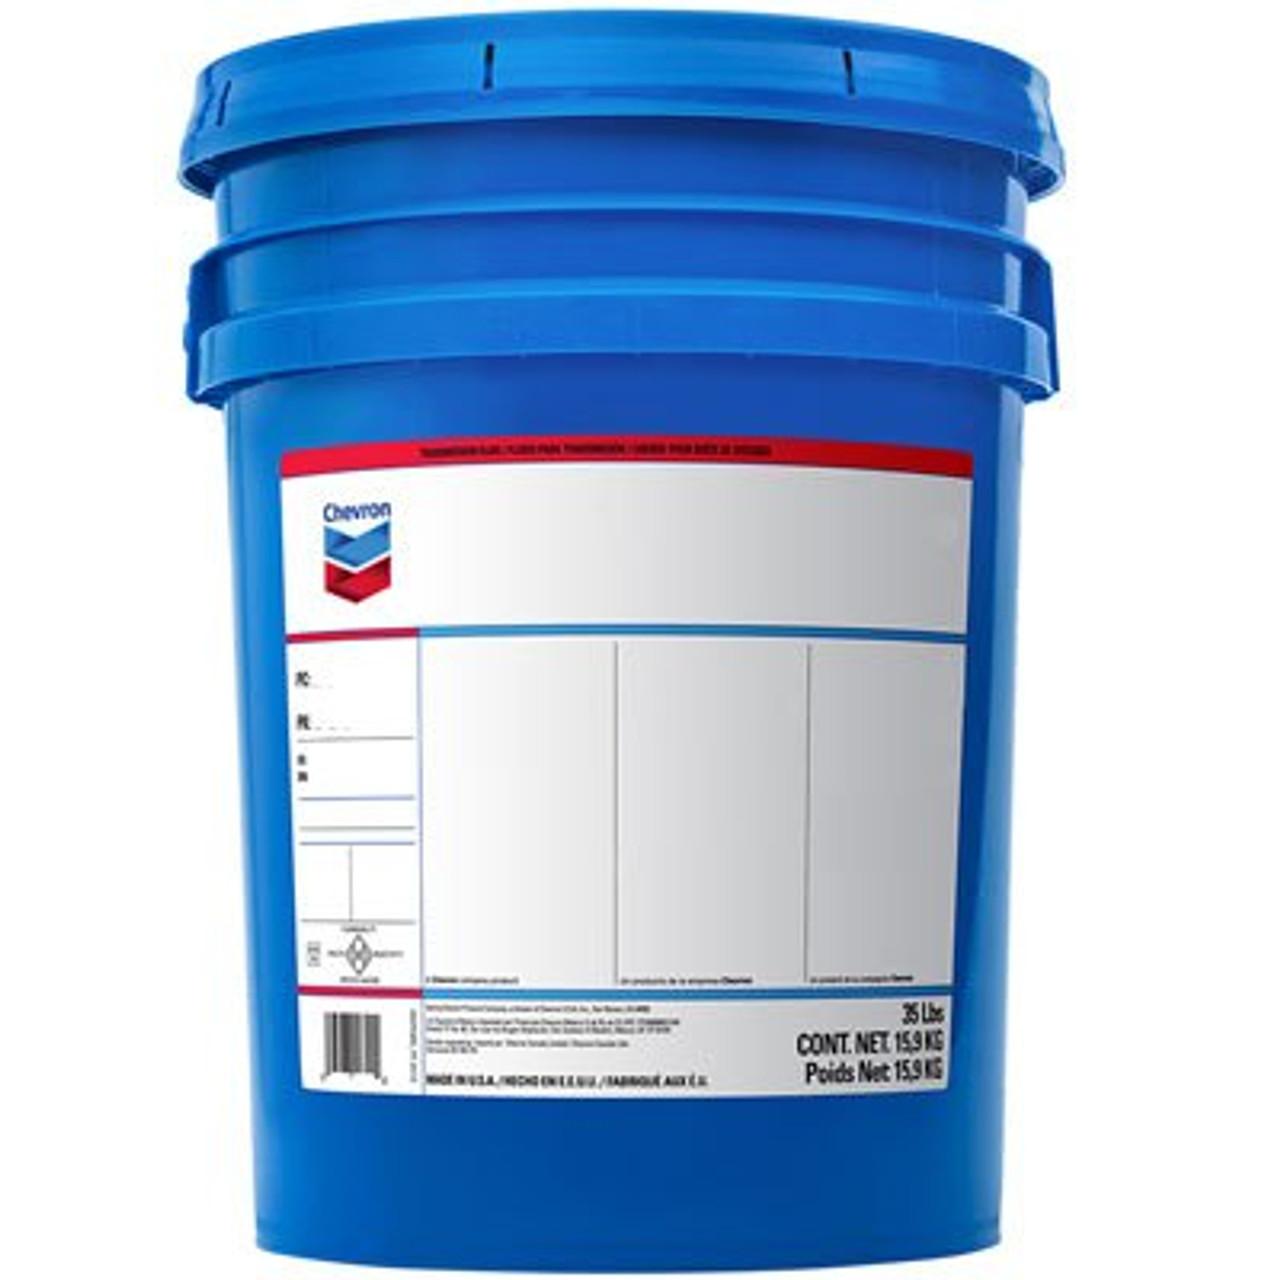 Chevron Cetus® HiPerSYN® 220 Synthetic Compressor Oil - 5 Gallon Pail